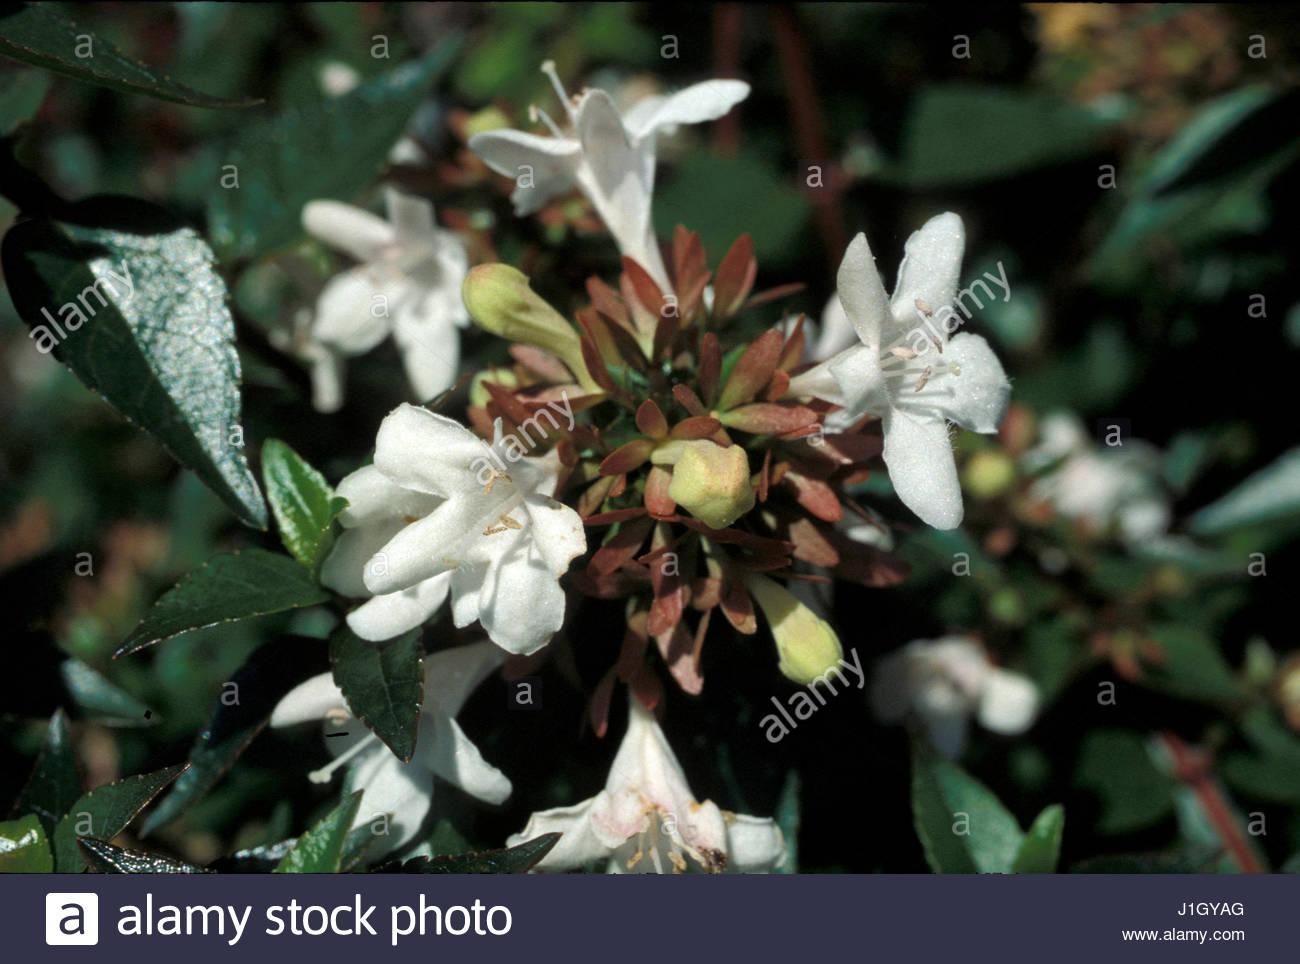 Abelia grandiflora evergreen shrub close up white flowers stock abelia grandiflora evergreen shrub close up white flowers summer autumn mightylinksfo